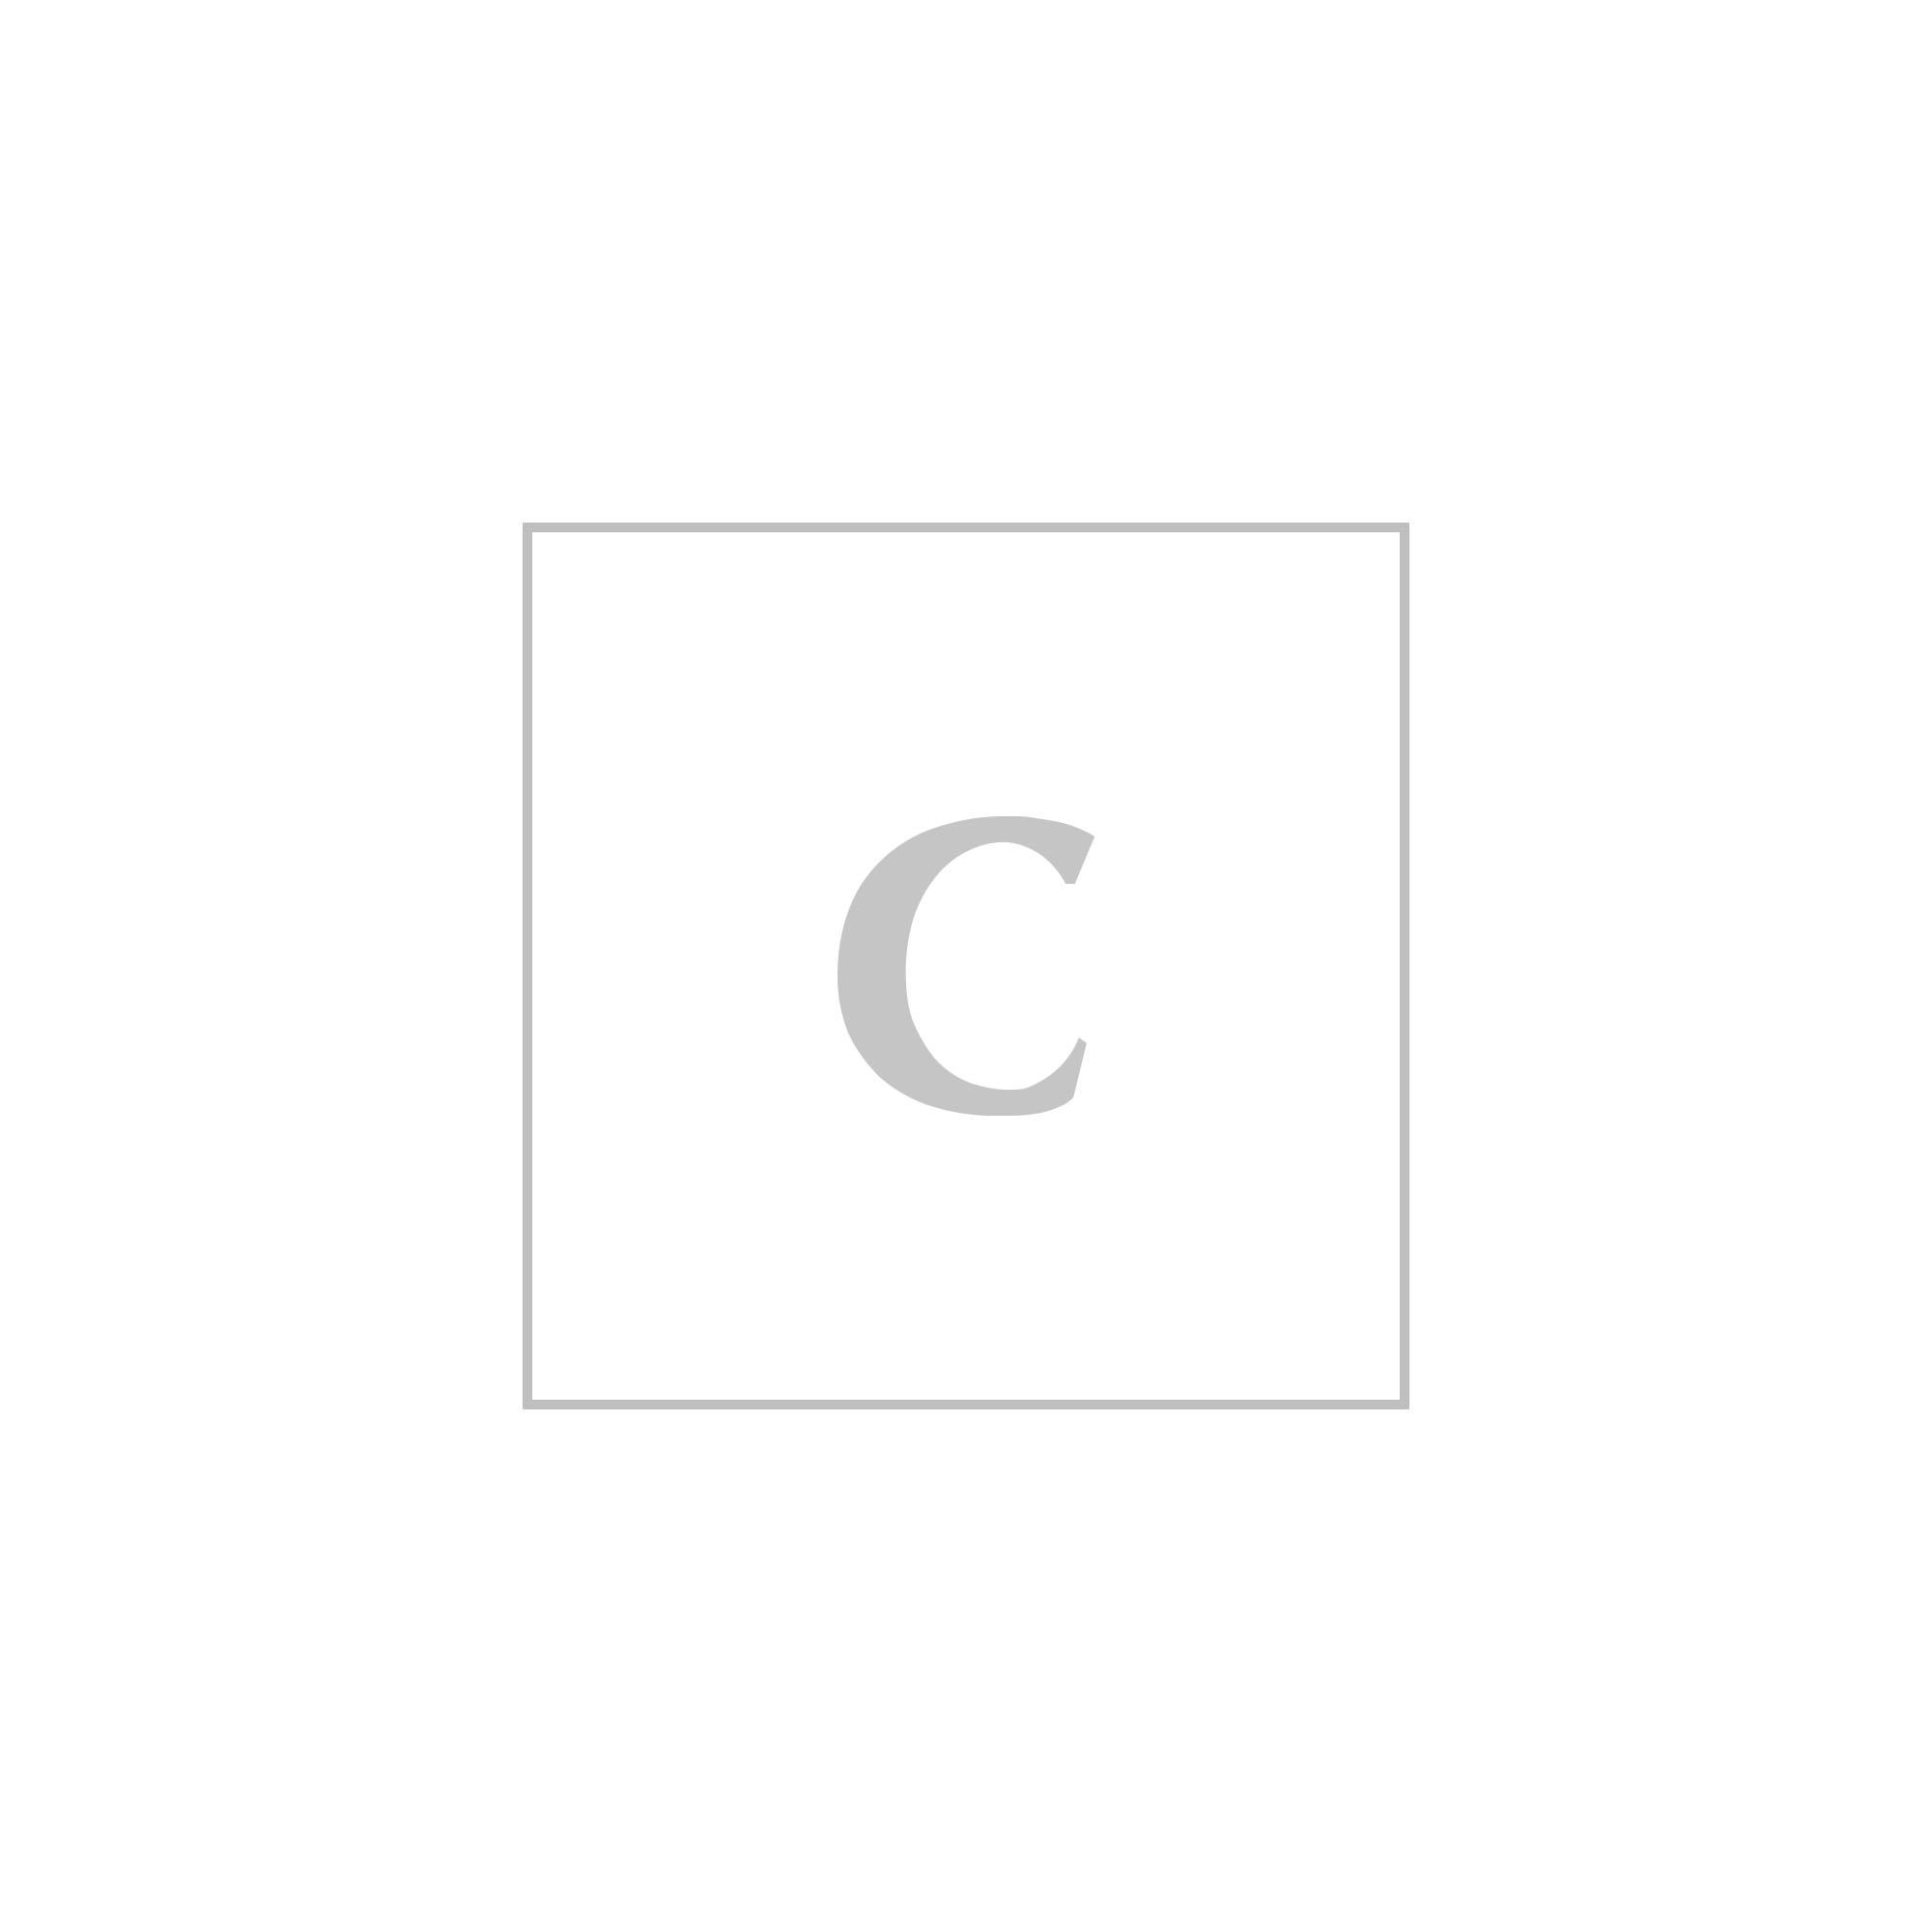 Saint laurent monogram new jolie clutch